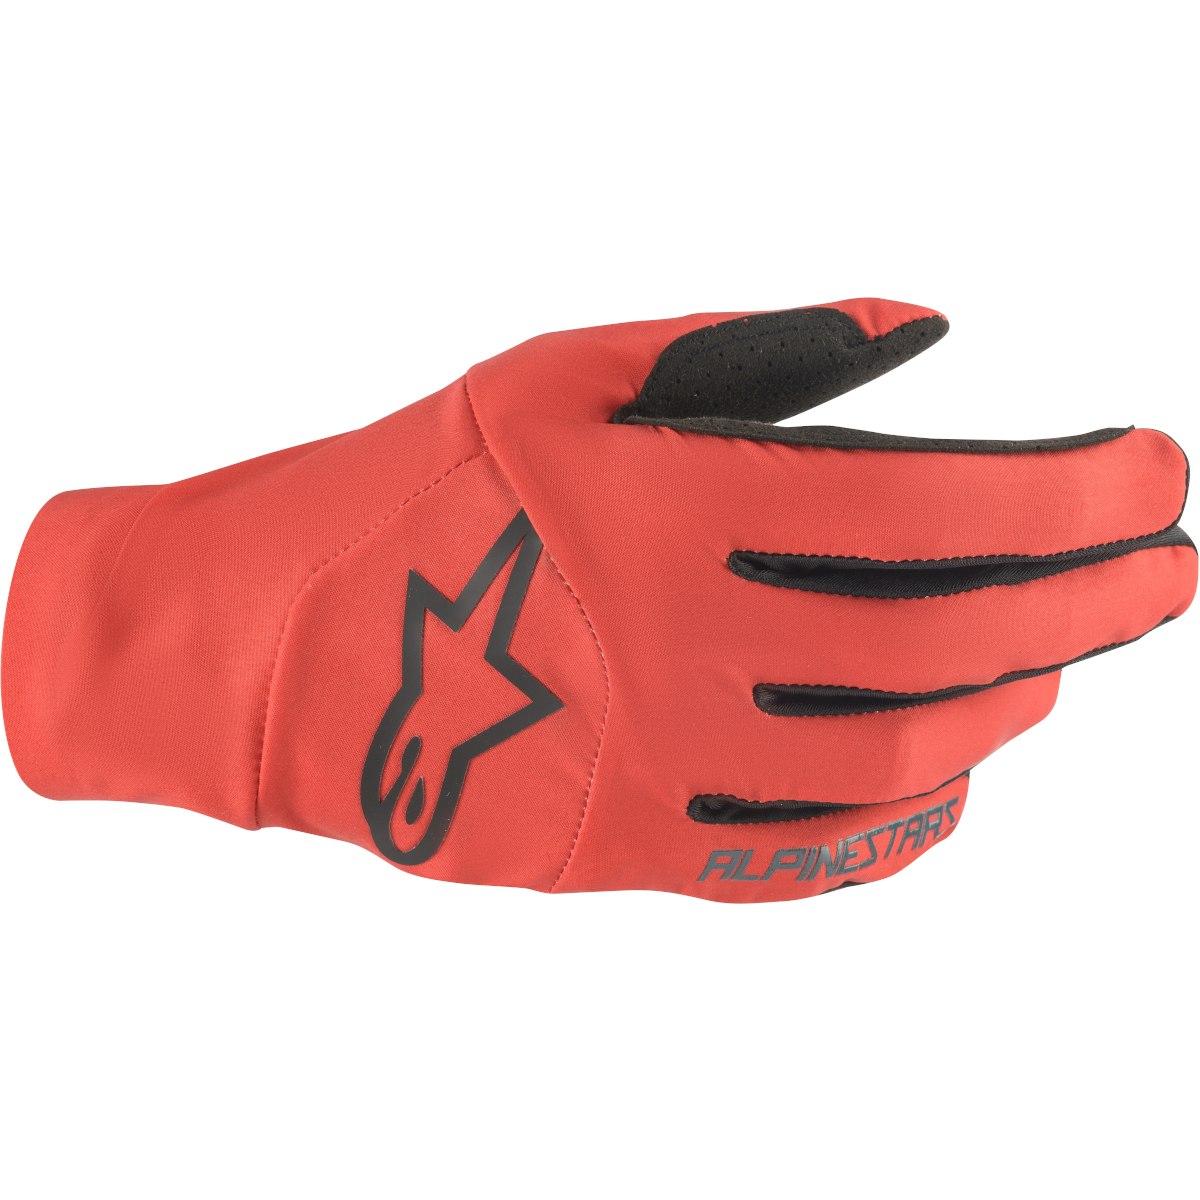 Alpinestars Drop 4.0 Glove Full Finger - red